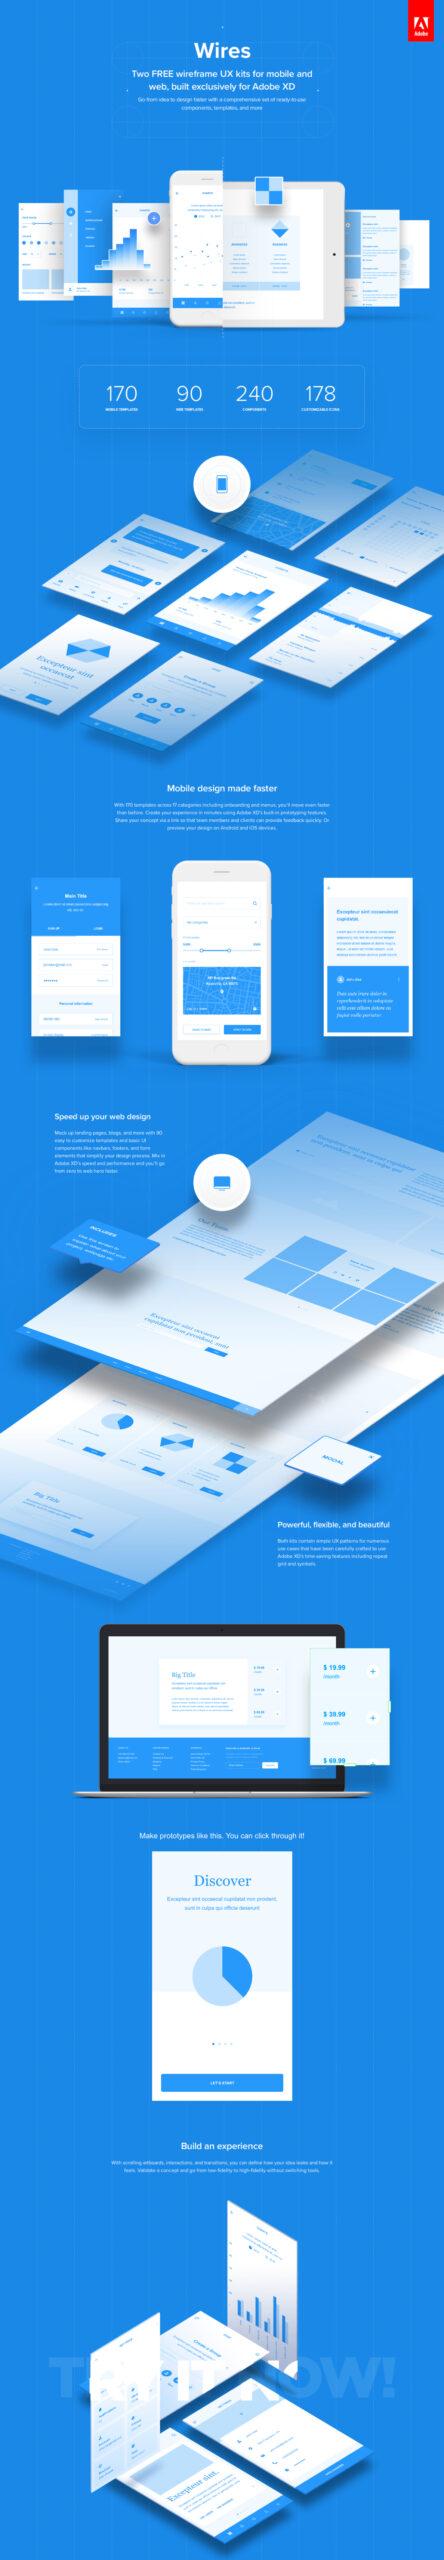 Wires – 免费APP&Web线框图设计套件插图